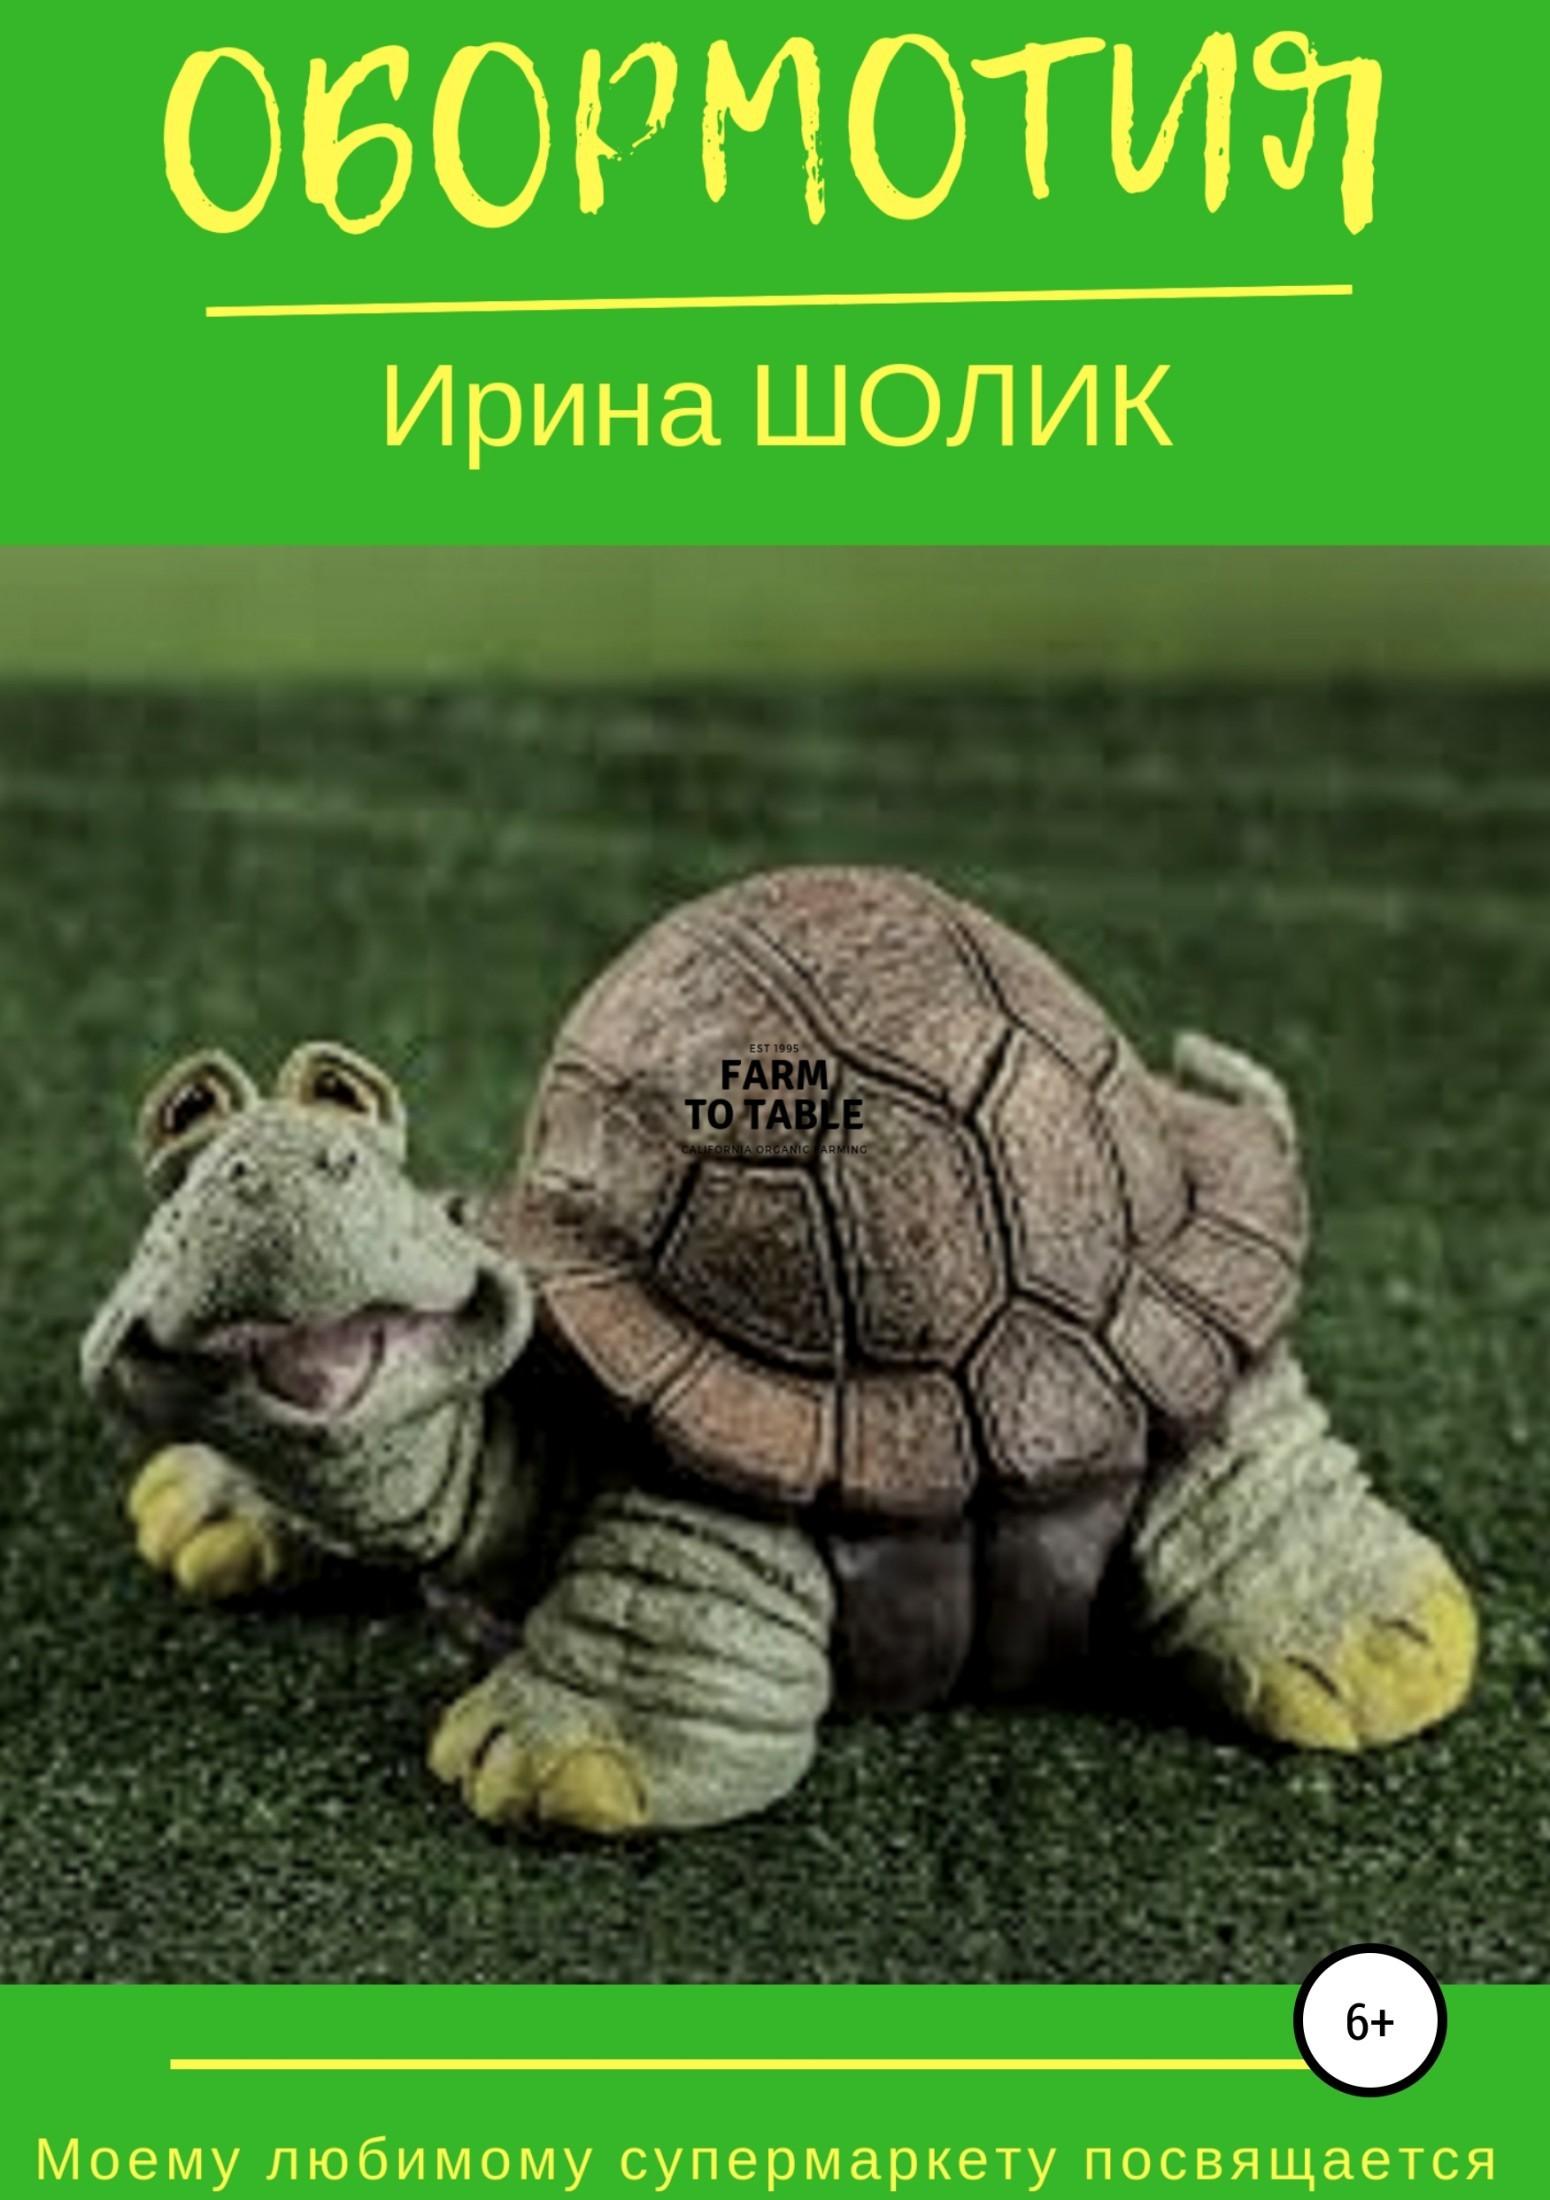 Ирина Шолик - Обормотия